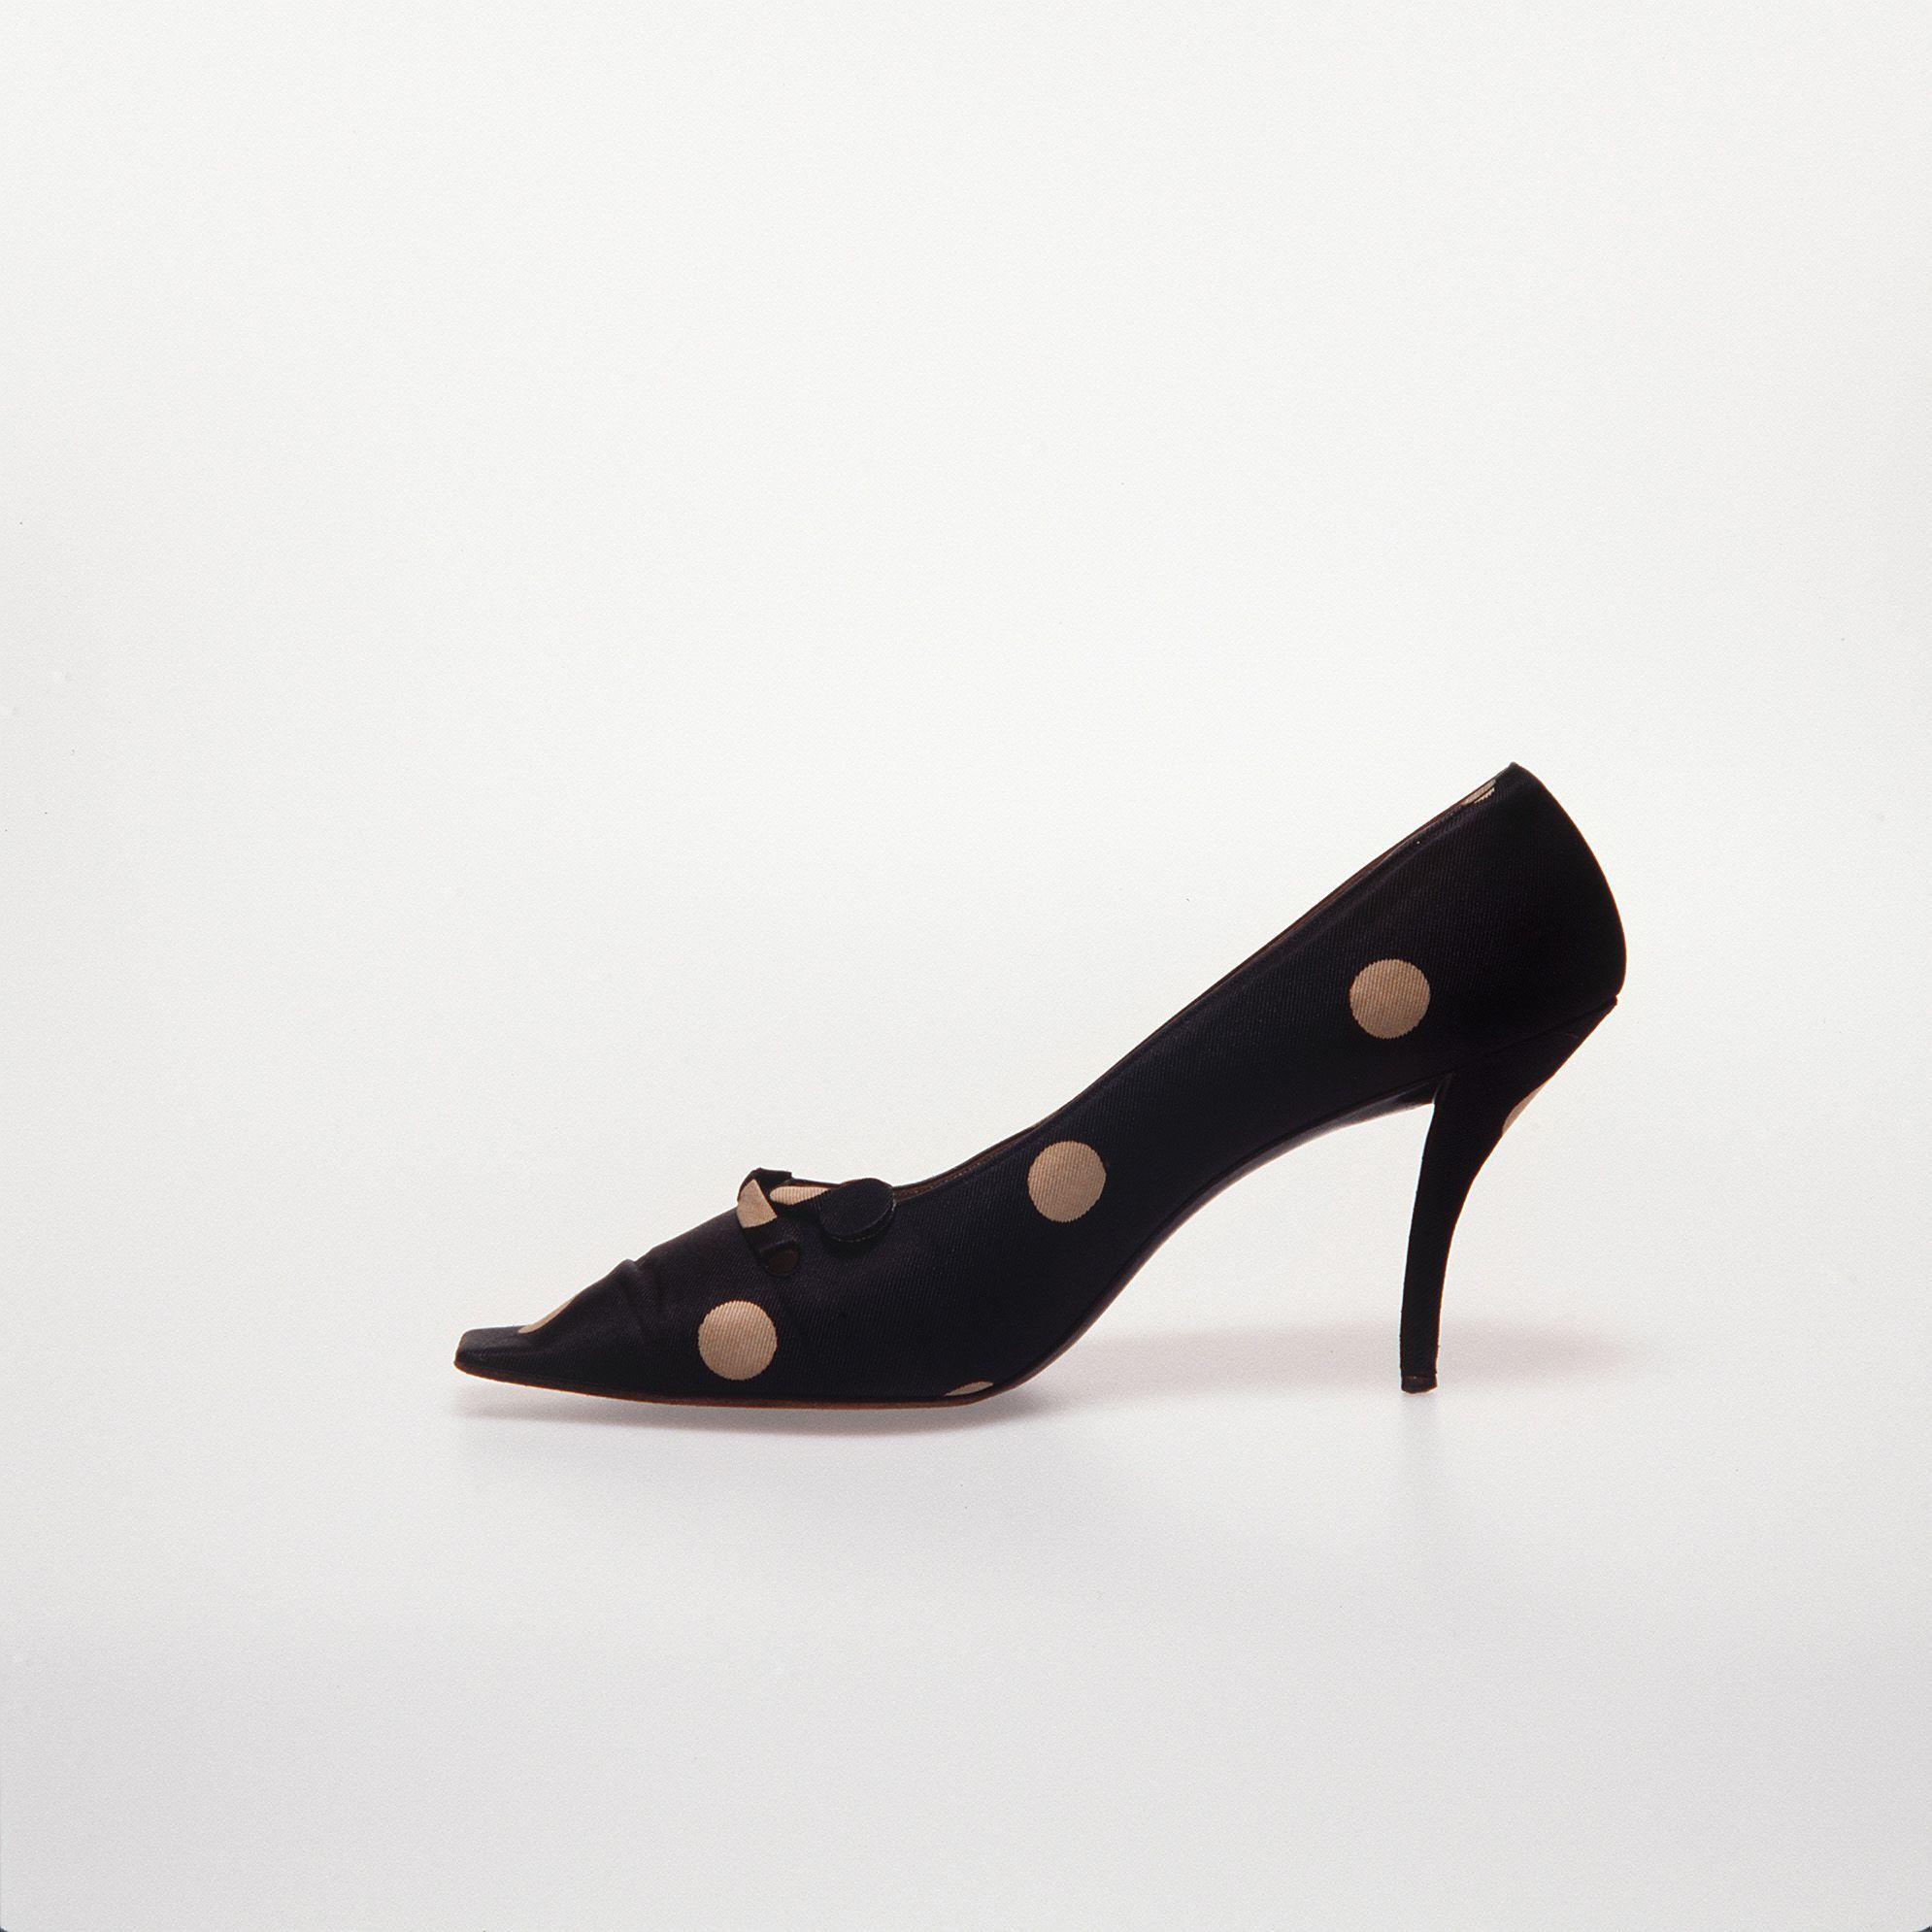 Museum Of Applied Arts Sciences Womens Silk Shoes Roger Vivier For Christian Dior France 1961 Roger Vivier Century Shoes Vivier